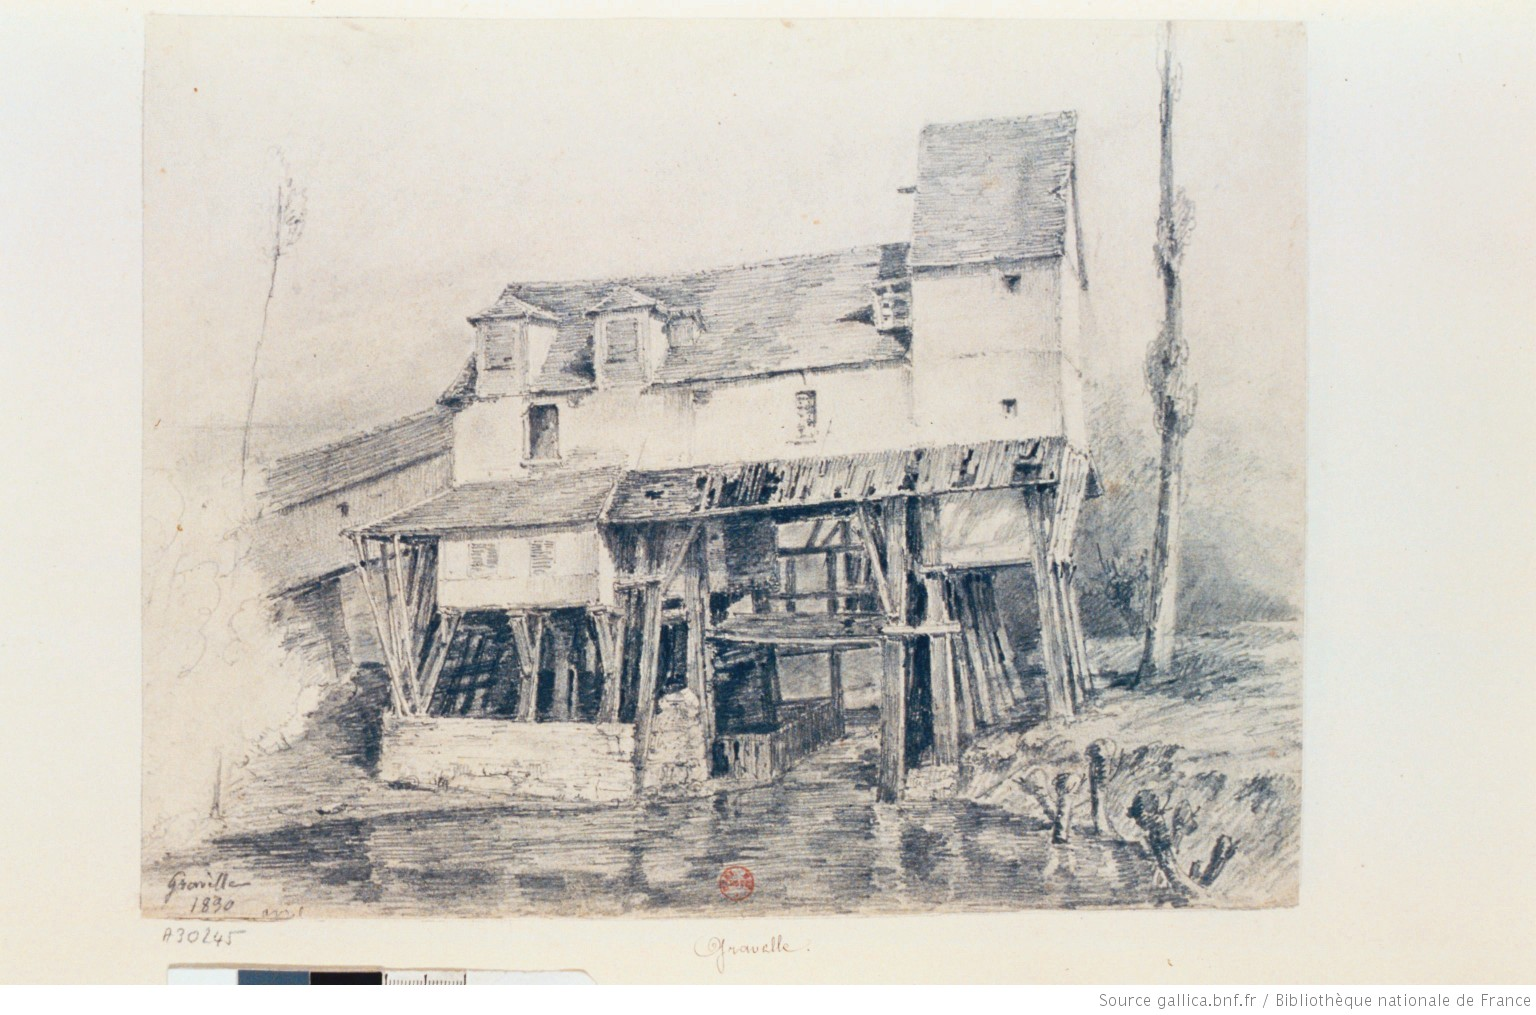 gravelle_-vue-daval-1830-gallica